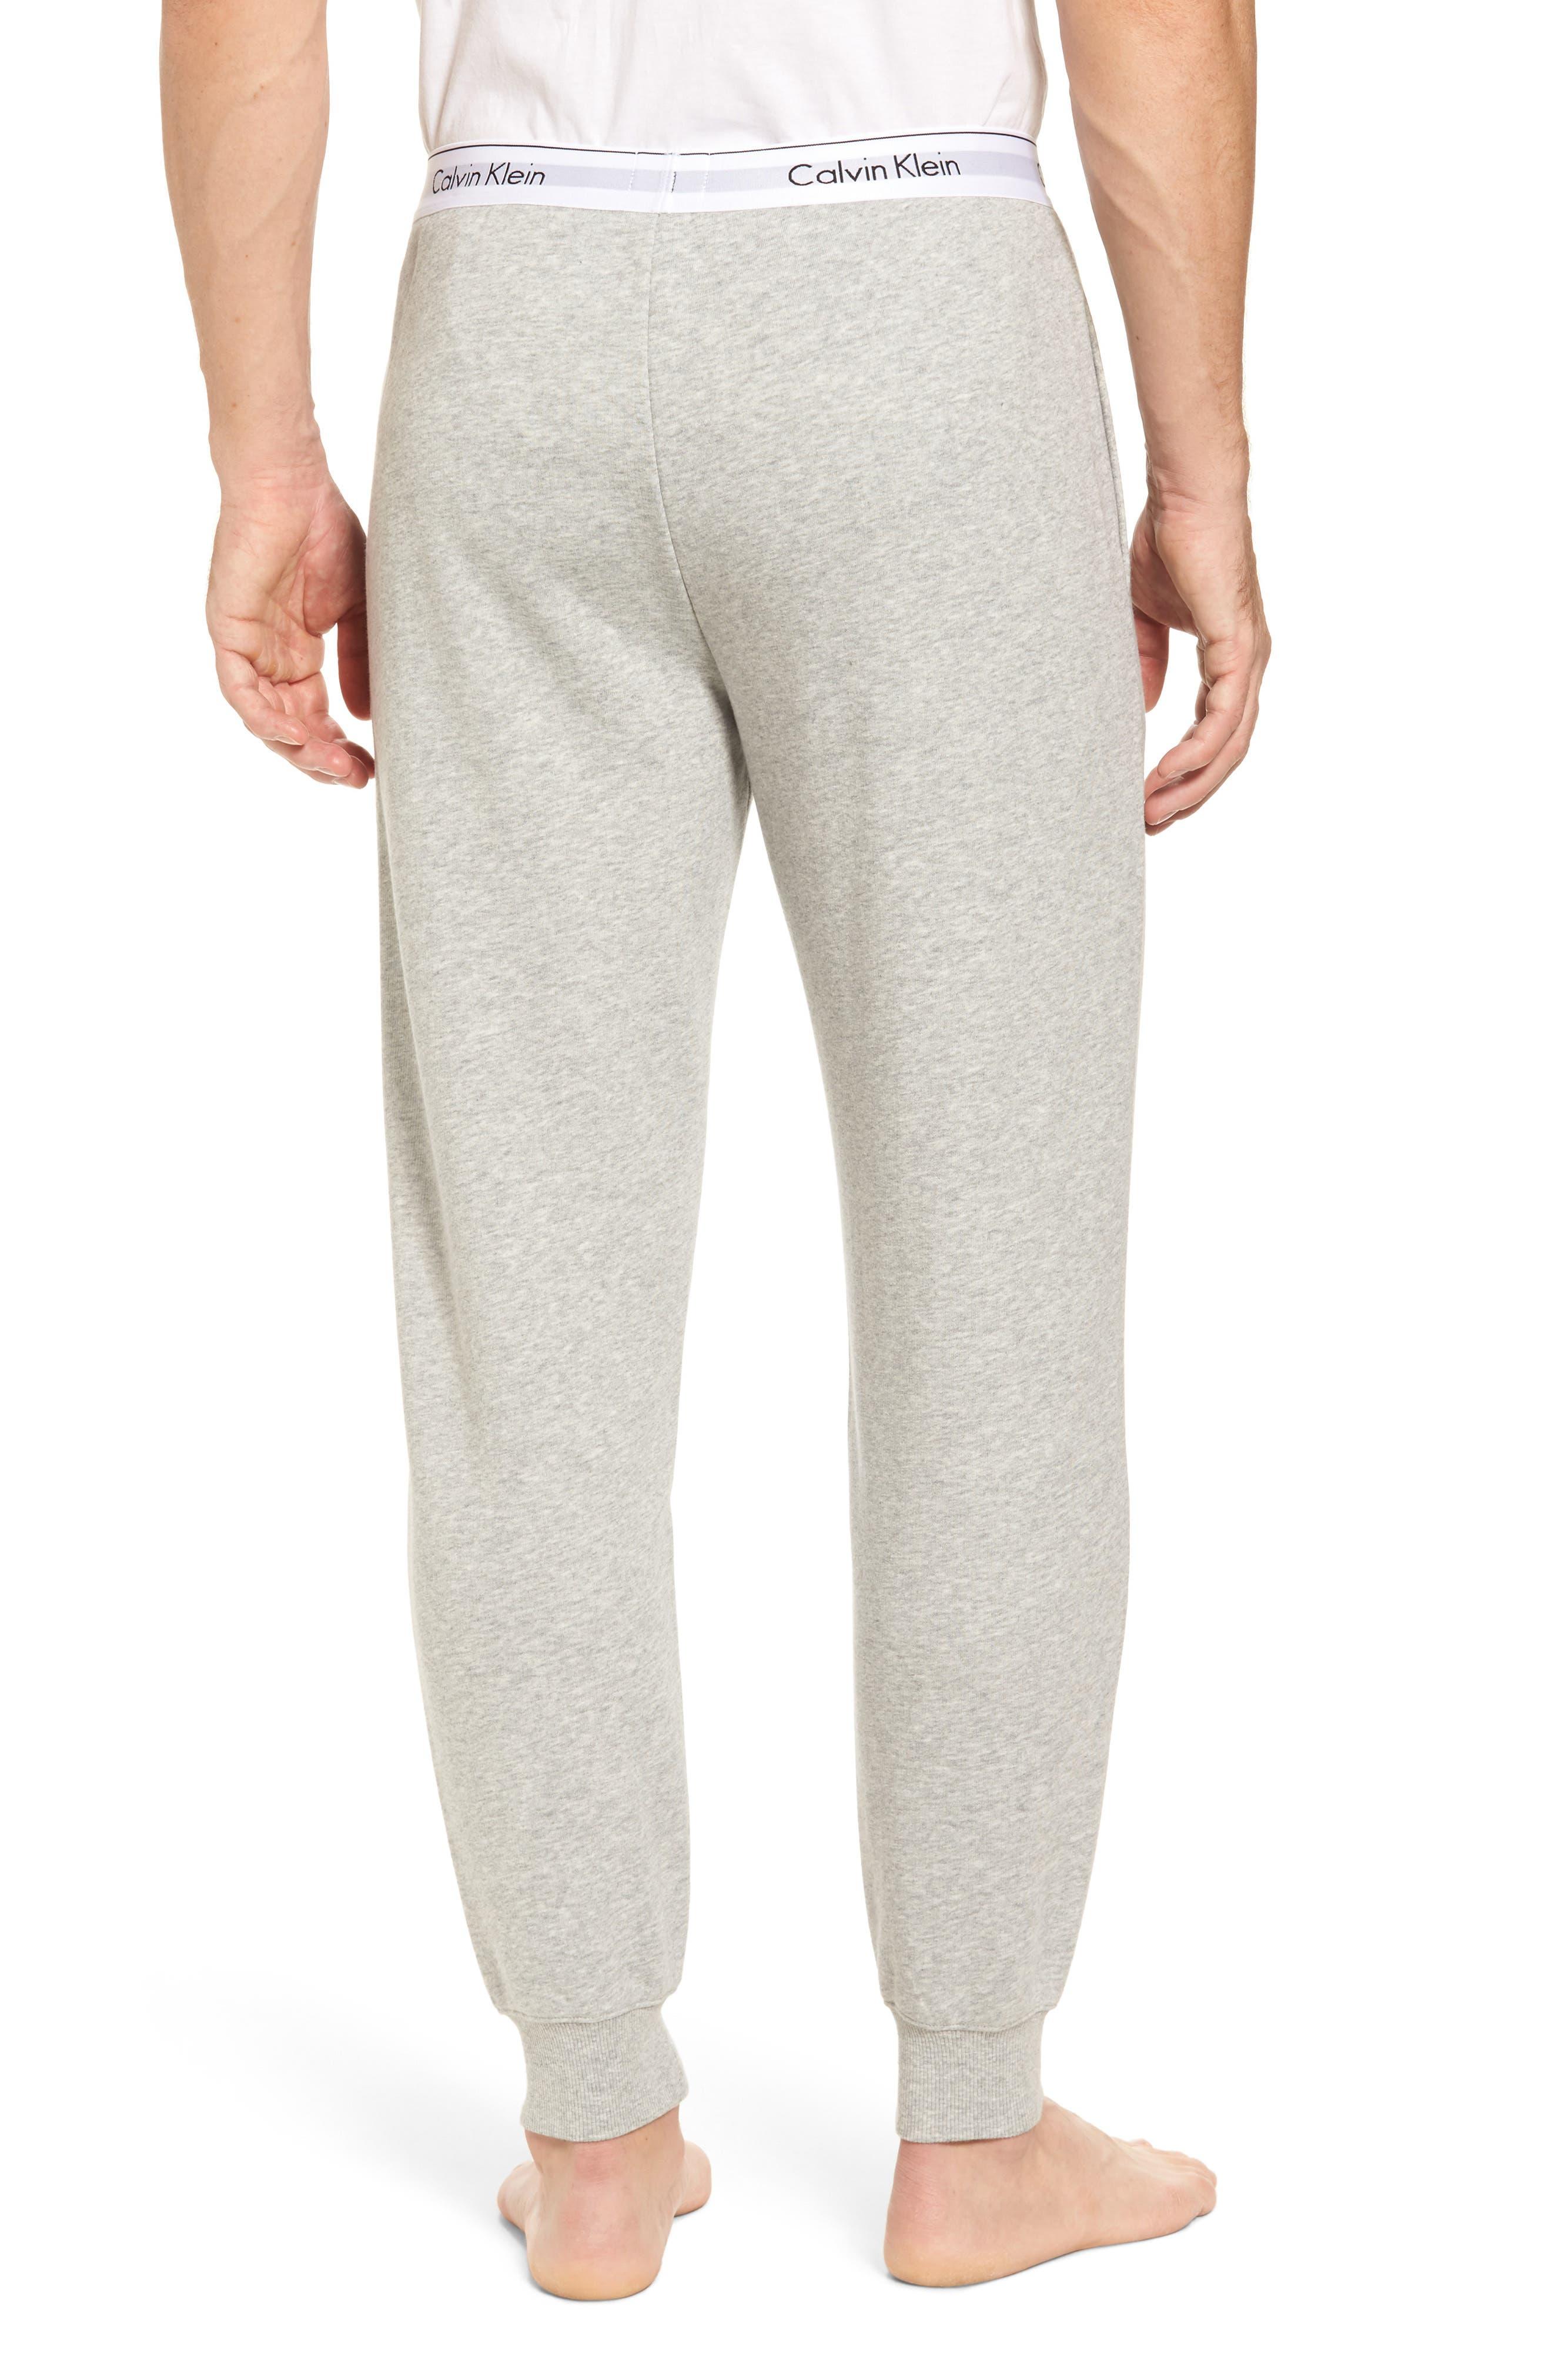 Modern Cotton Blend Lounge Pants,                             Alternate thumbnail 2, color,                             Grey Heather